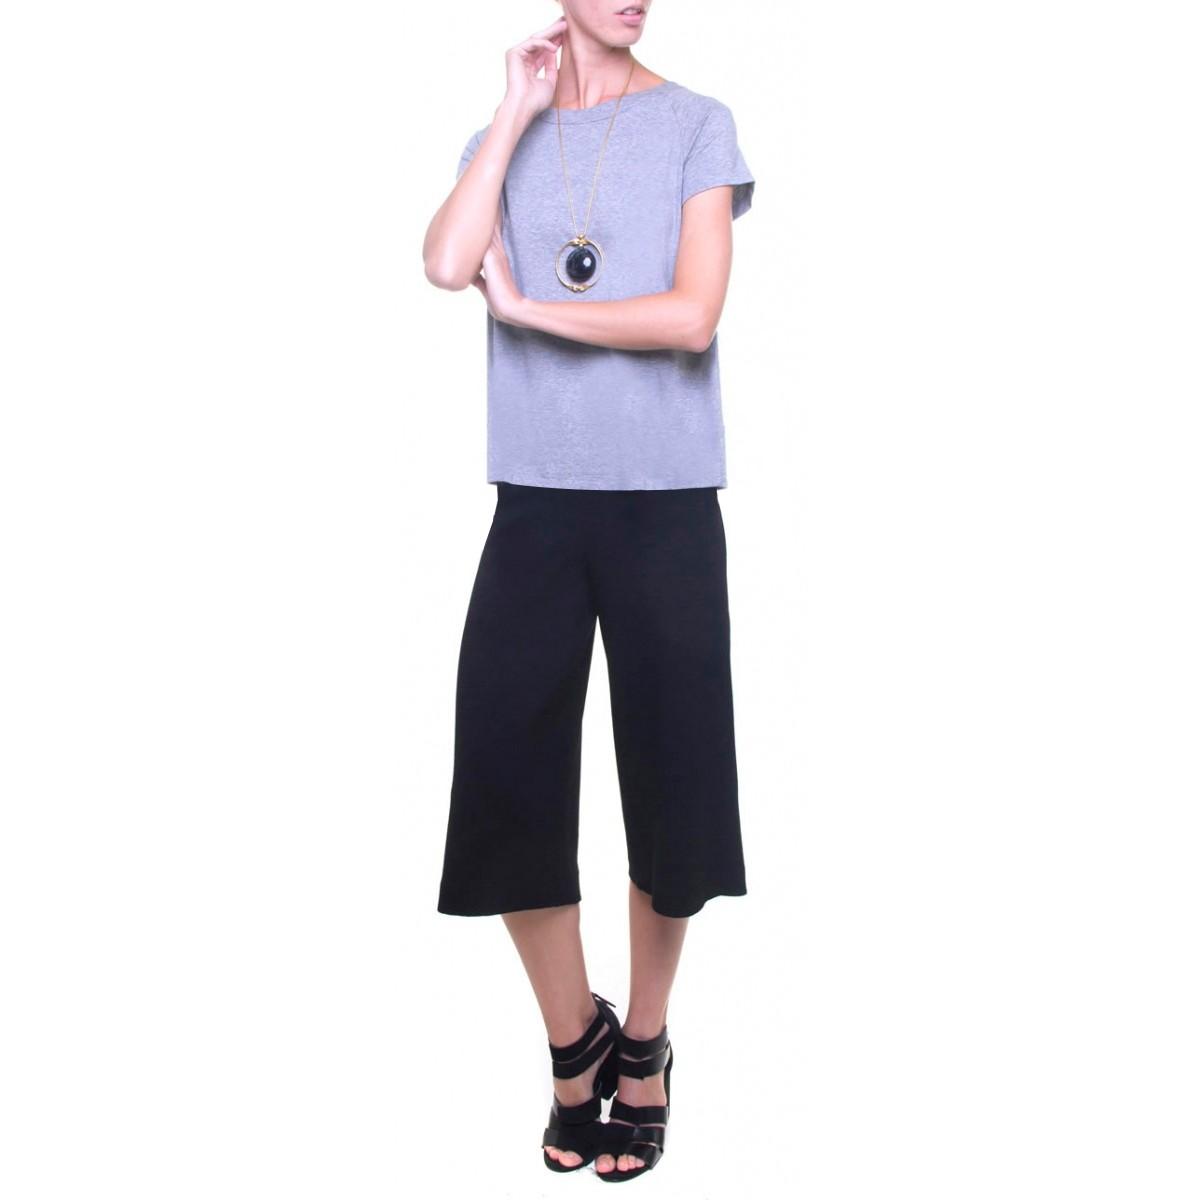 55830f1d62 blusa viscose mescla decote canoa - Camisetas   Blusas - SHOP